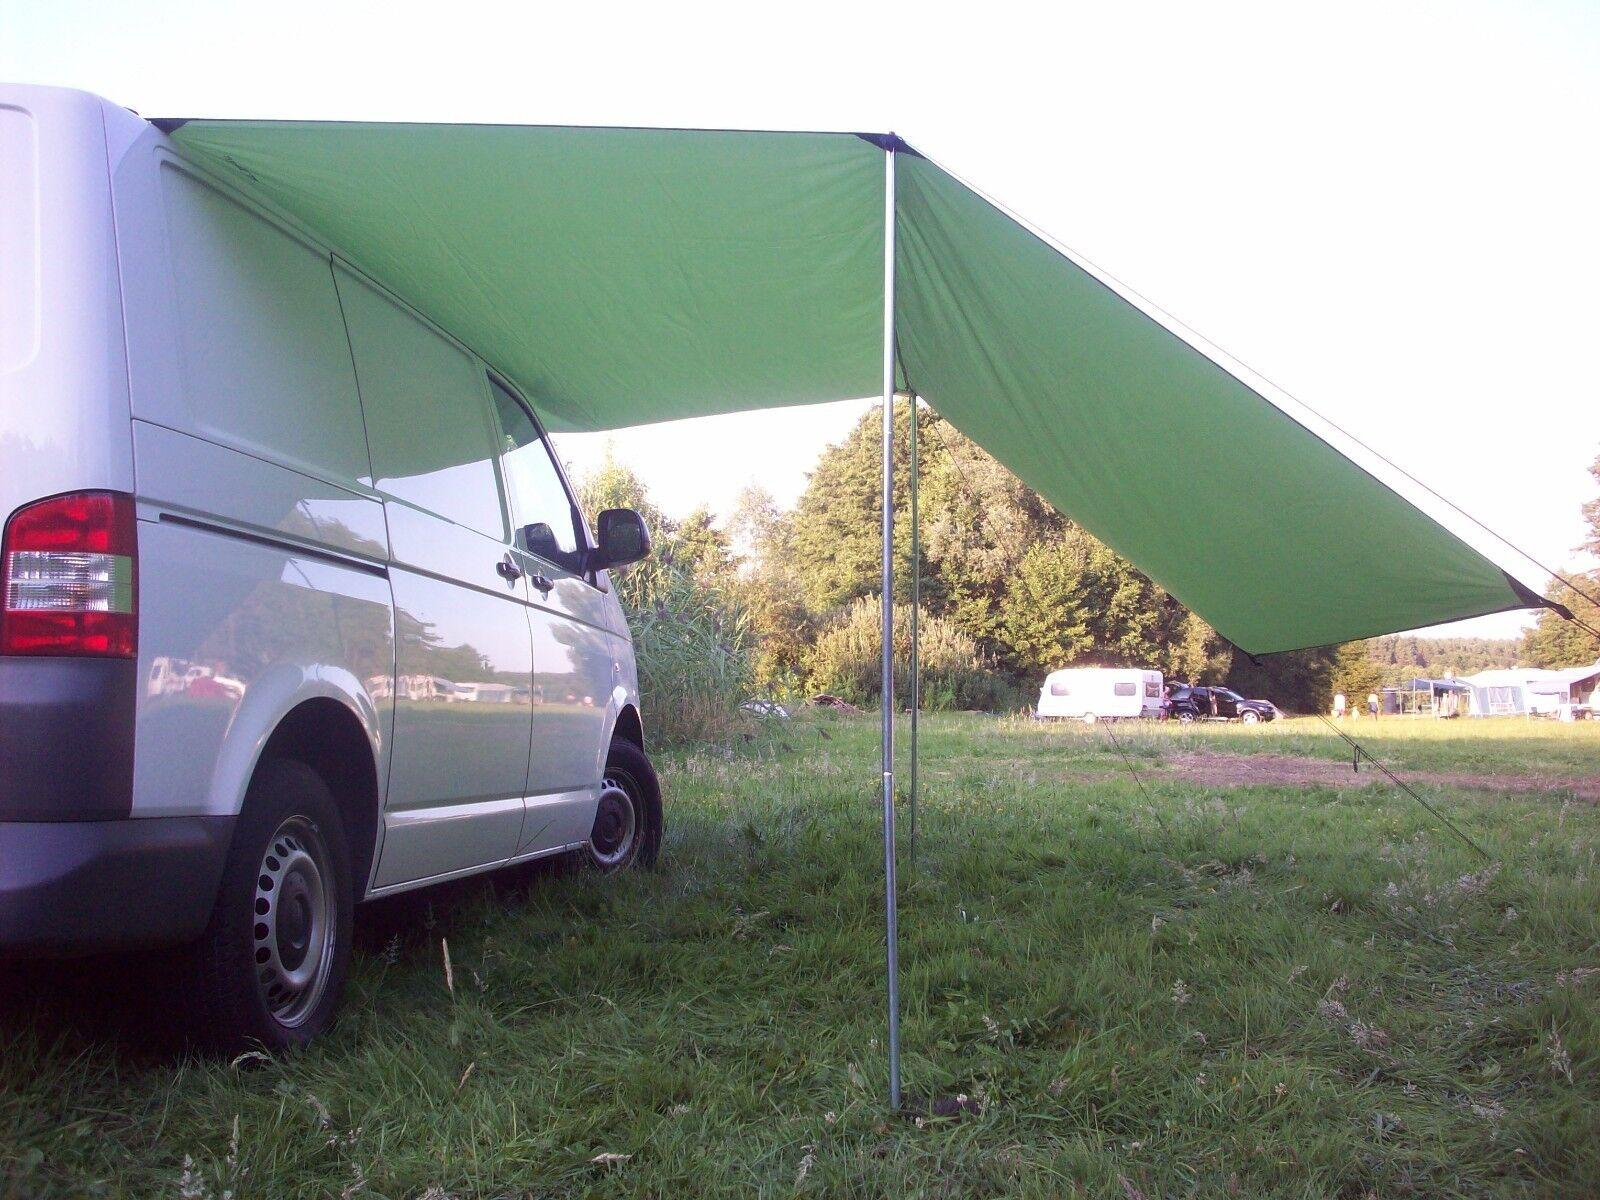 Sonnensegel-Vorzelt-Markise-Vordach-Sonnendach VW Bus Bulli T1-T2-T3-T4-T5 Fiat.